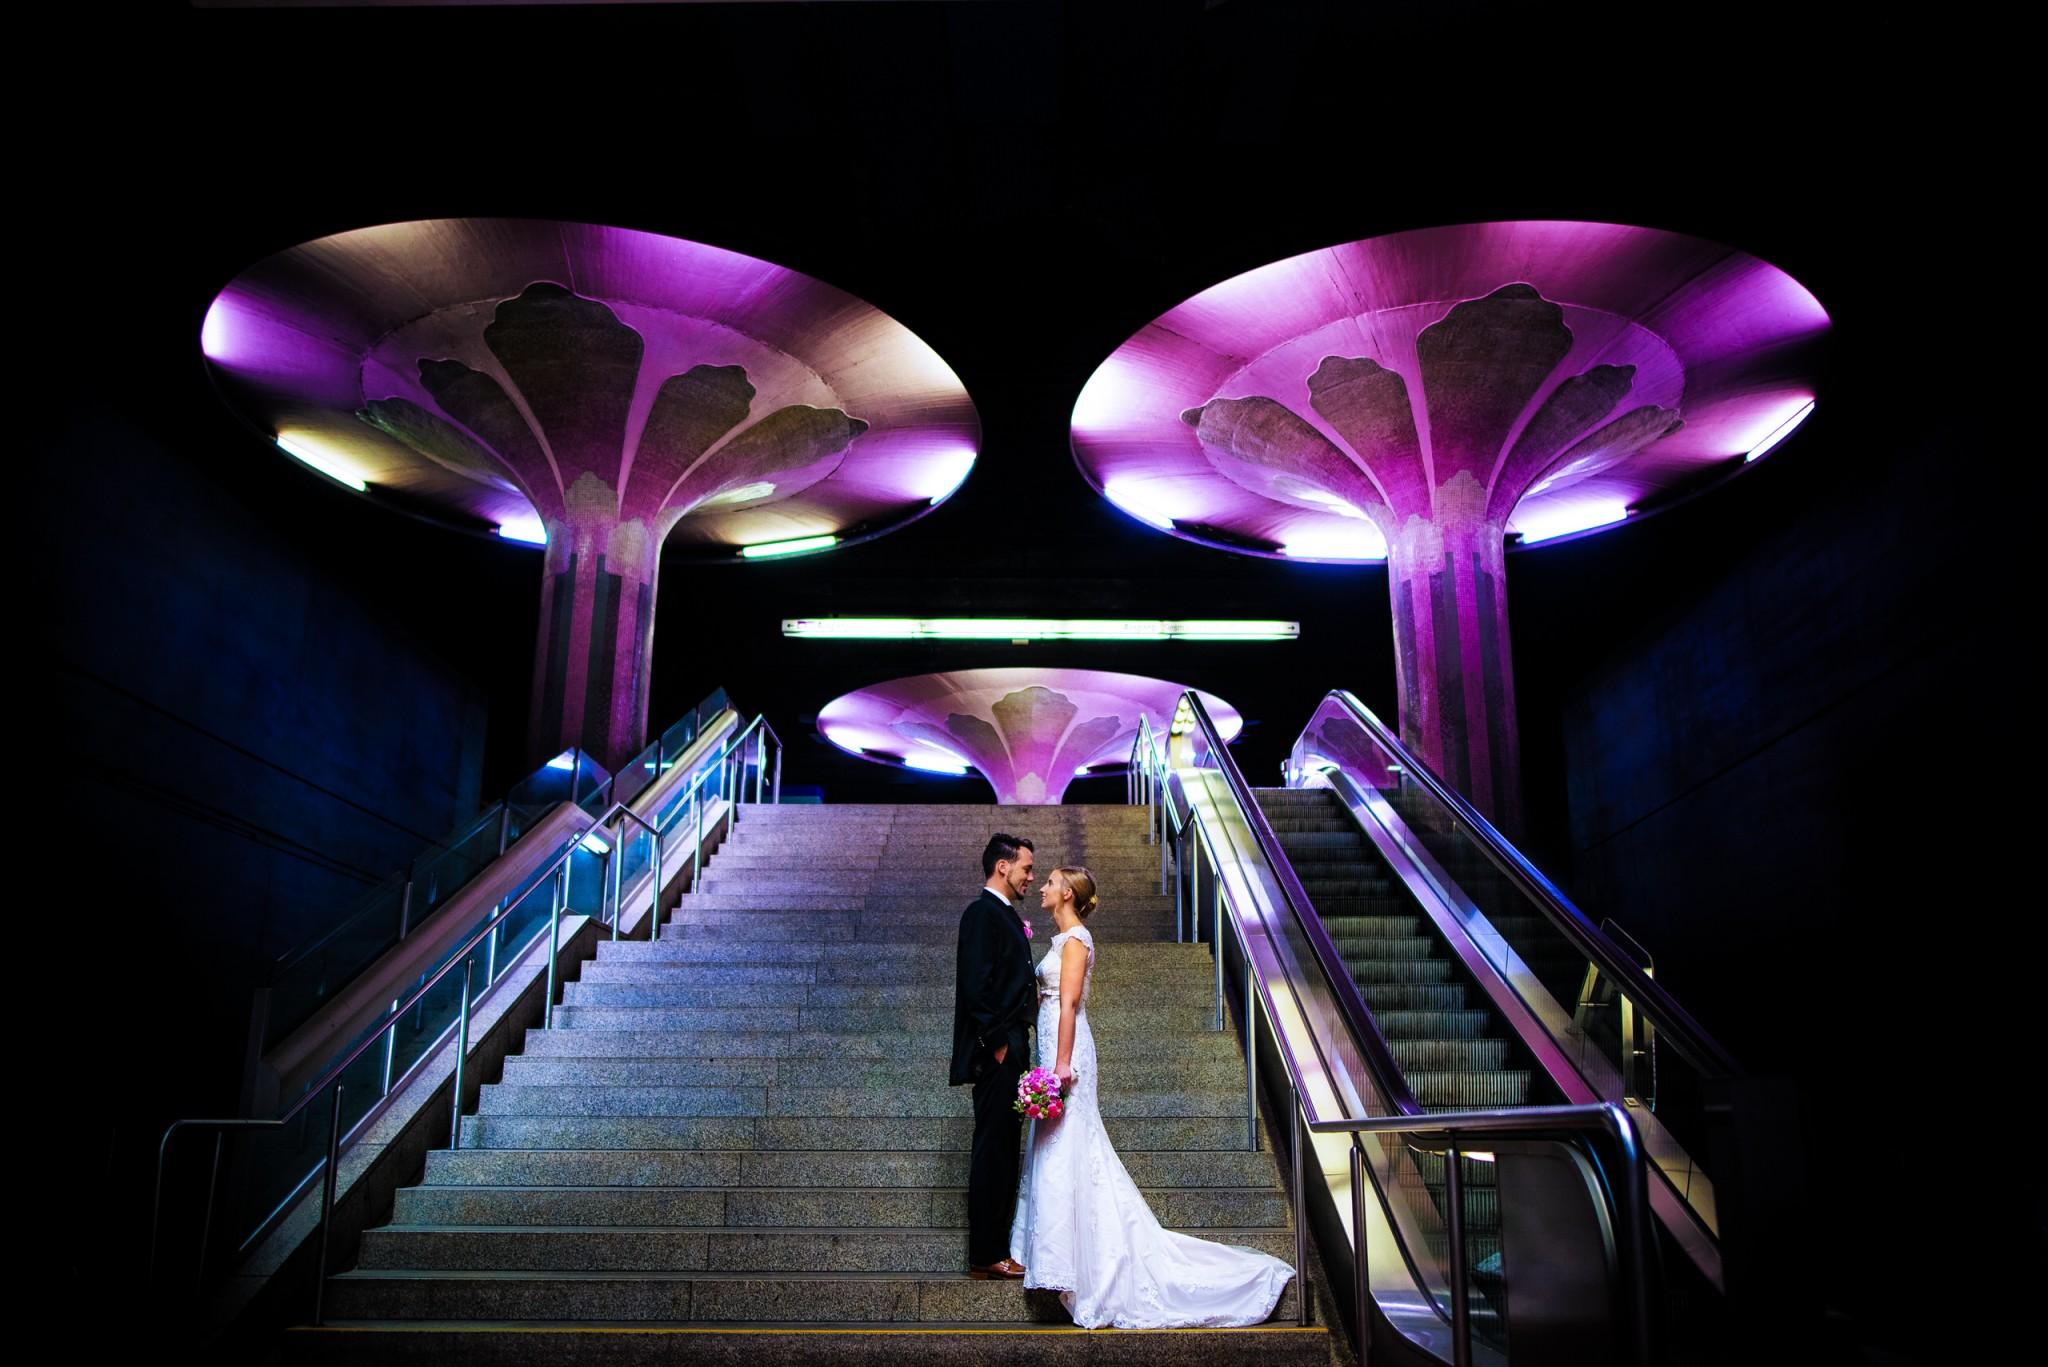 Hochzeitsfotograf-Frankfurt-160820-151952-4454-Art